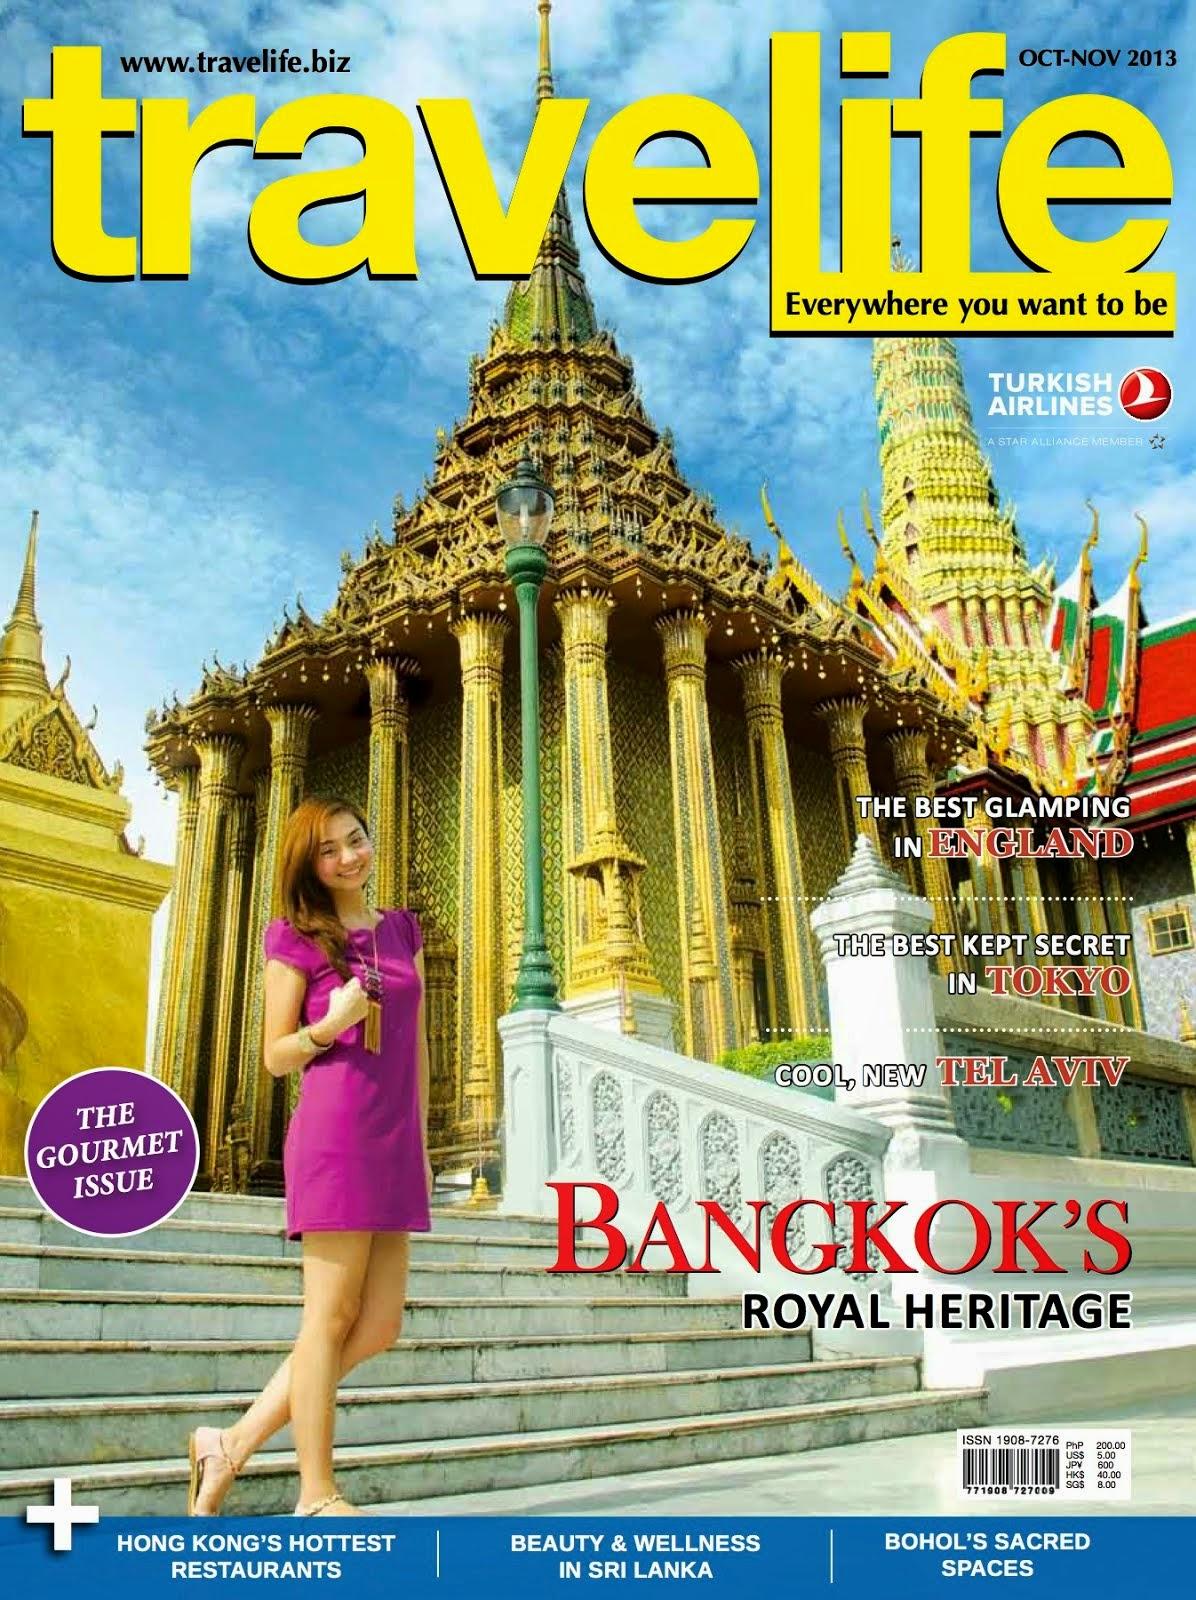 BANGKOK'S ROYAL HERITAGE